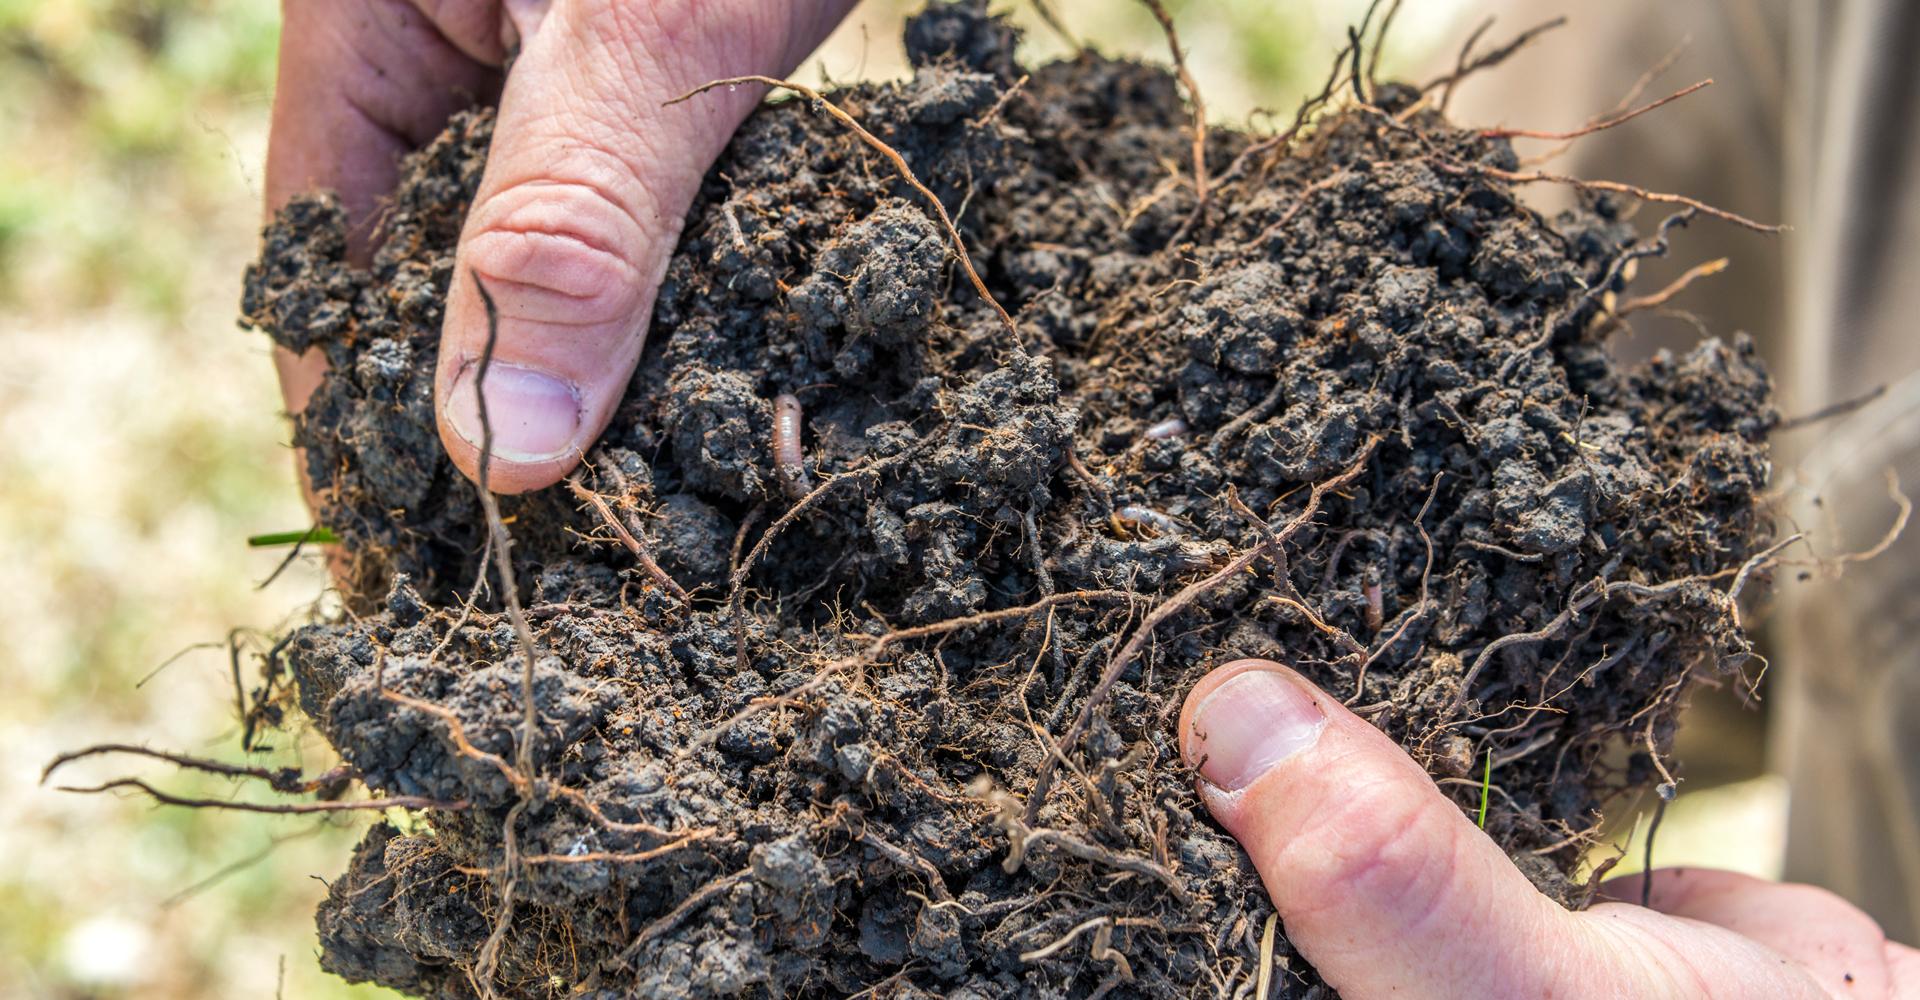 SoilOrganisms